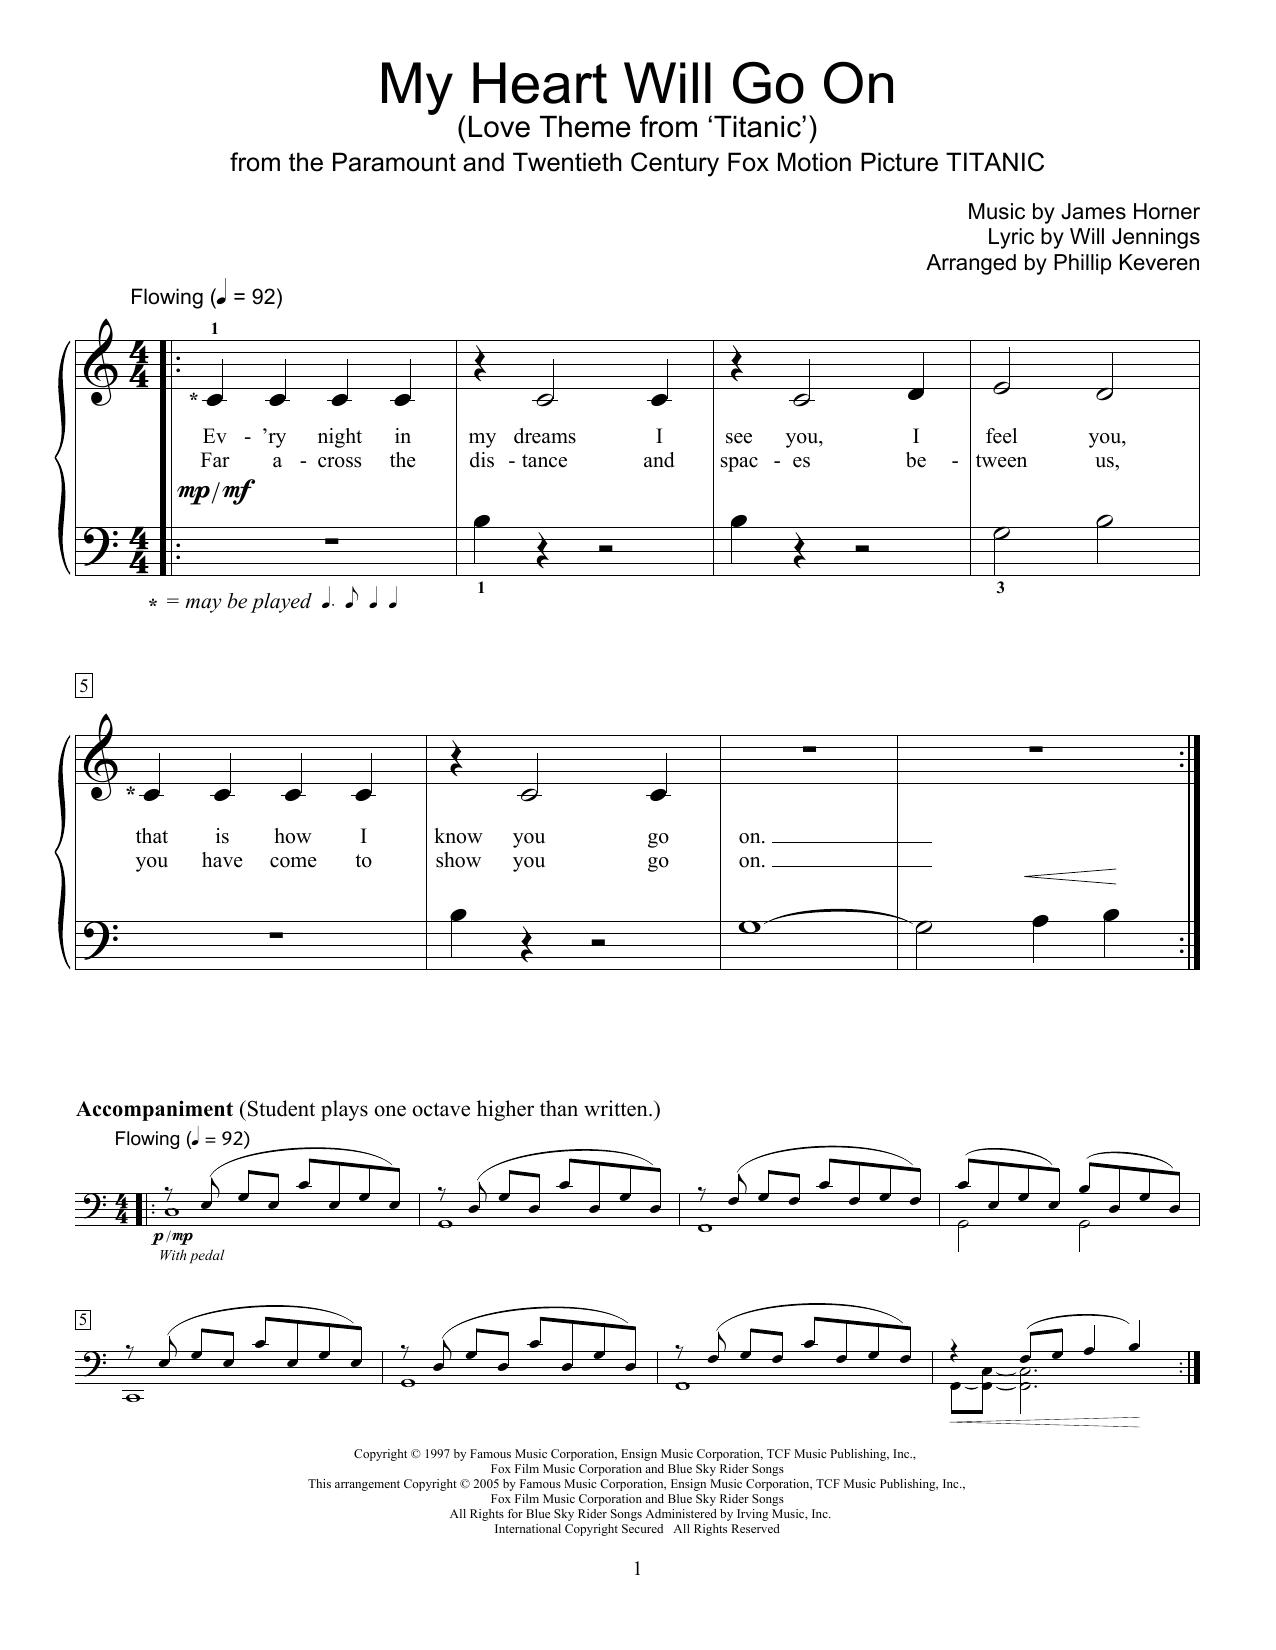 Deja Vu - My Heart Will Go On (Love Theme From 'Titanic')